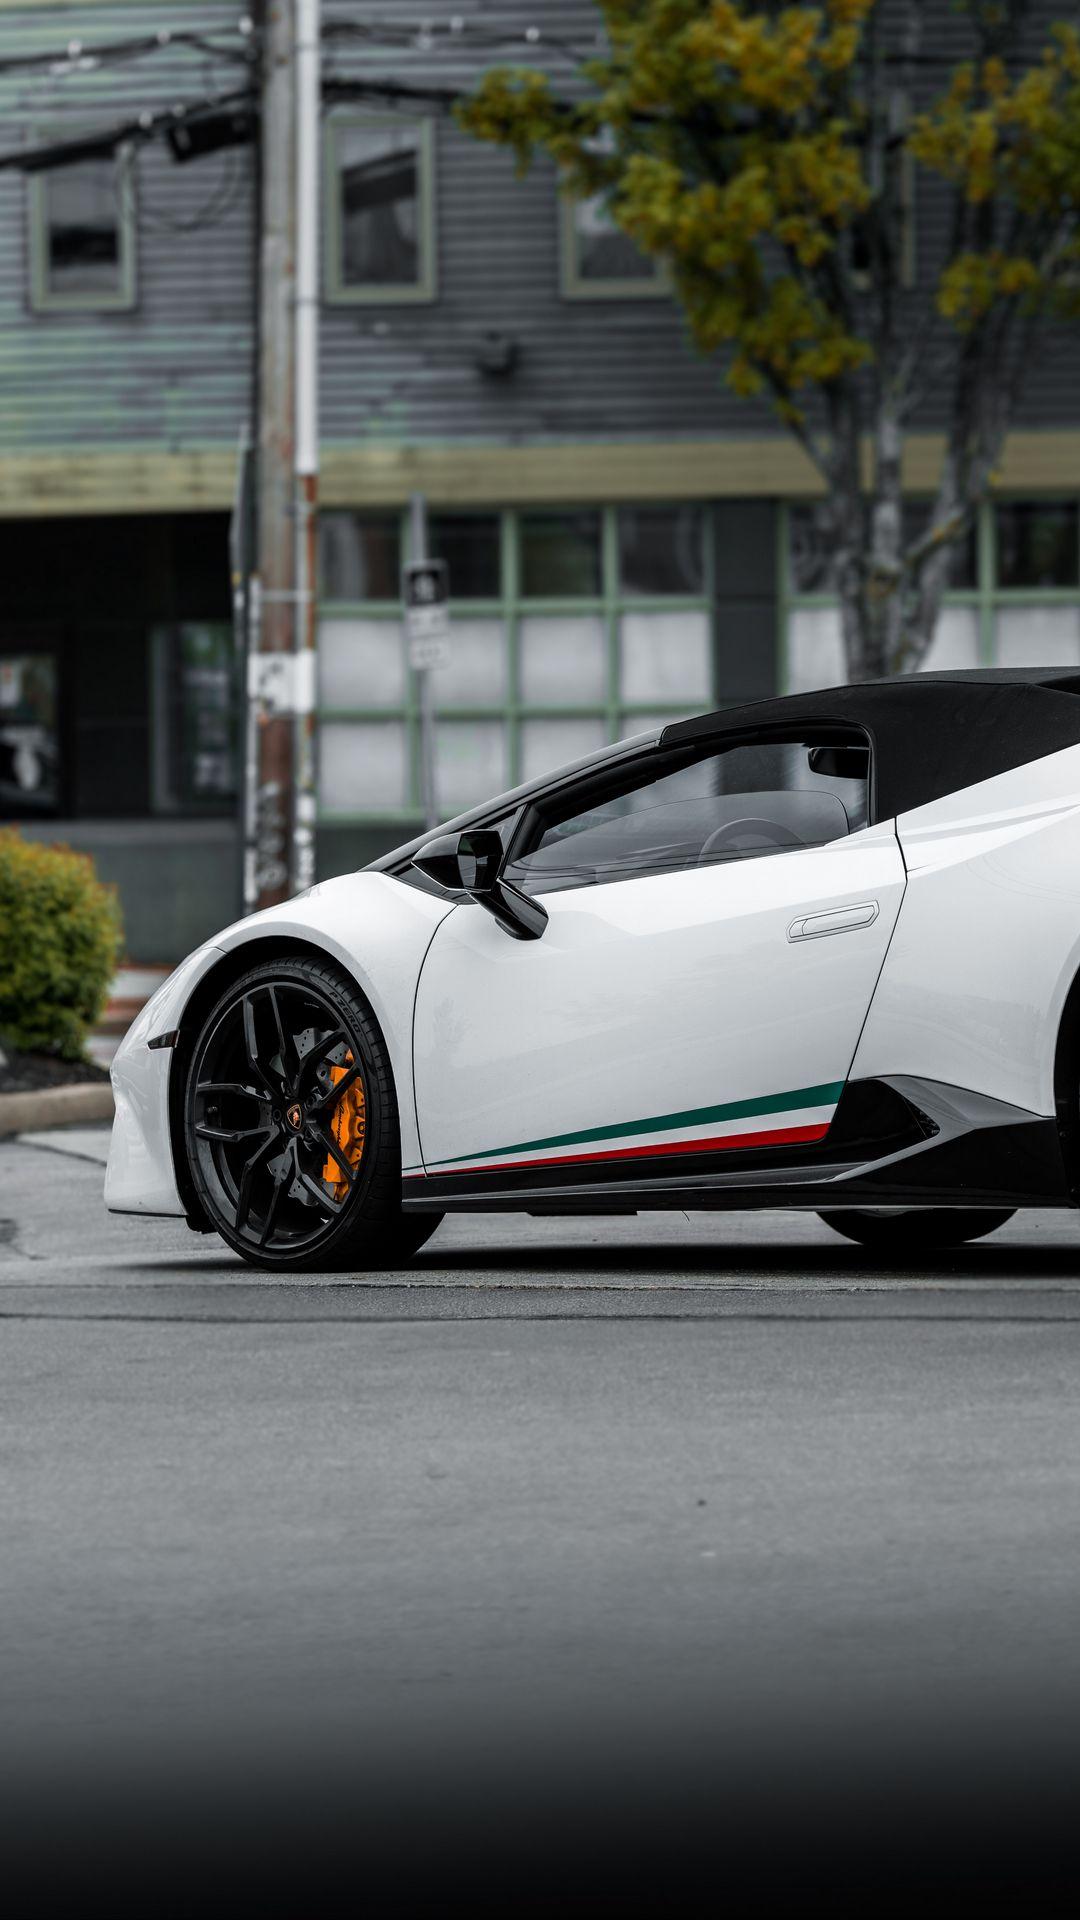 Lamborghini Sports Wallpapers Free Download